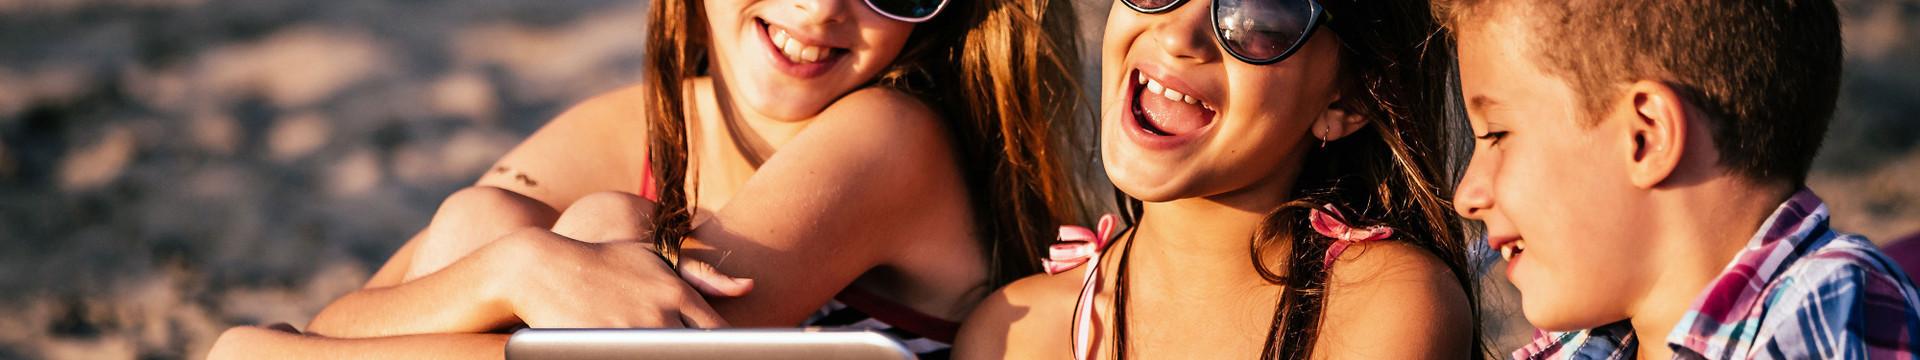 School Trip Hotel Rates In Cocoa Beach